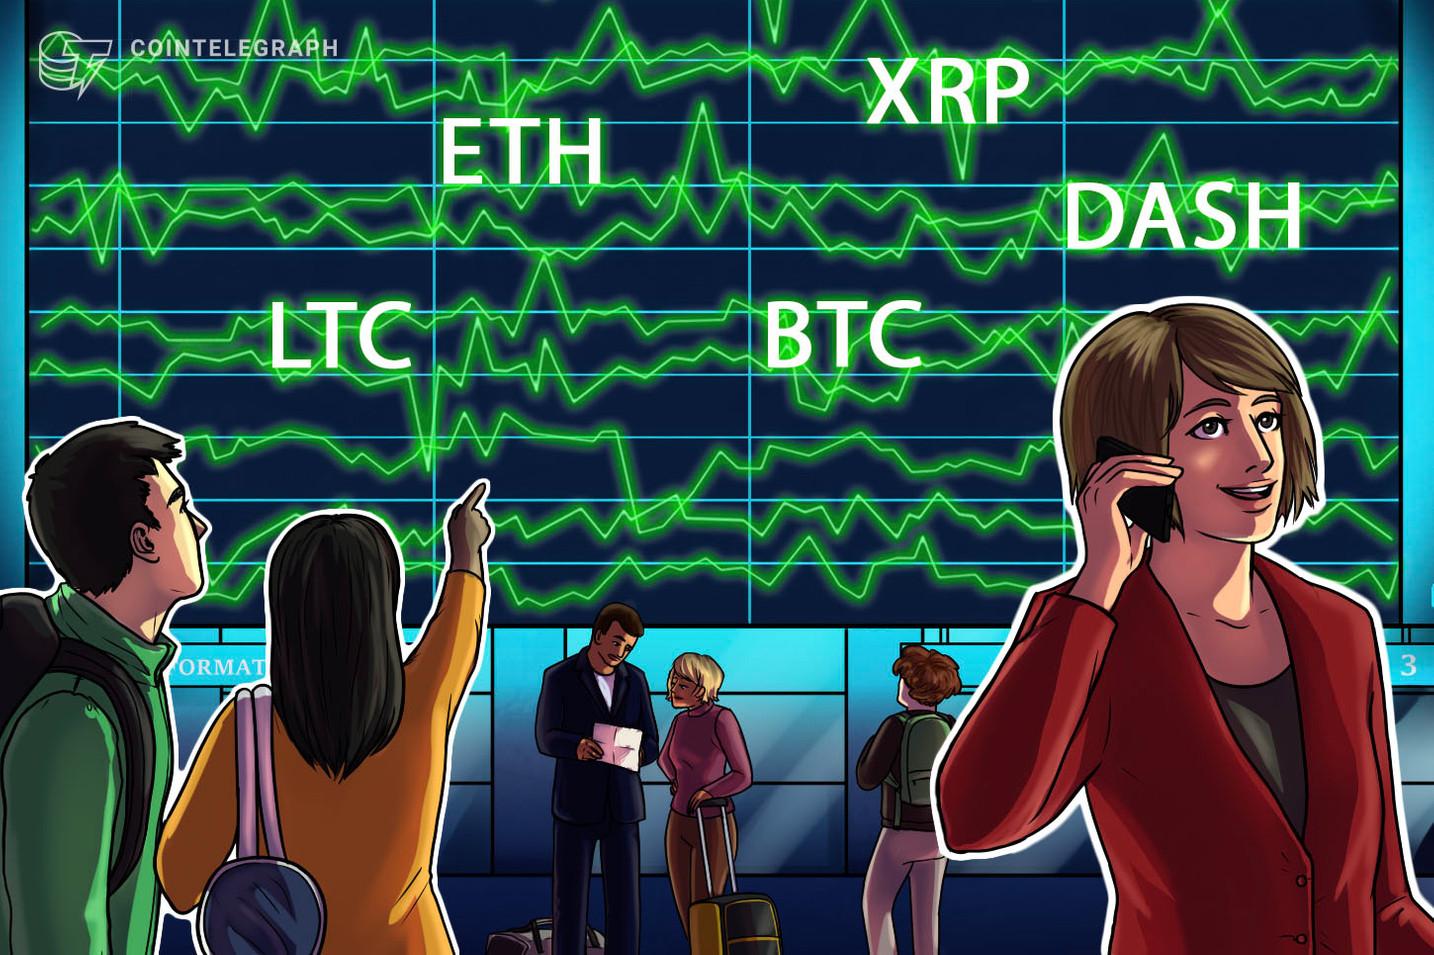 Las 5 principales criptomonedas para observar esta semana: BTC, ETH, XRP, LTC, DASH